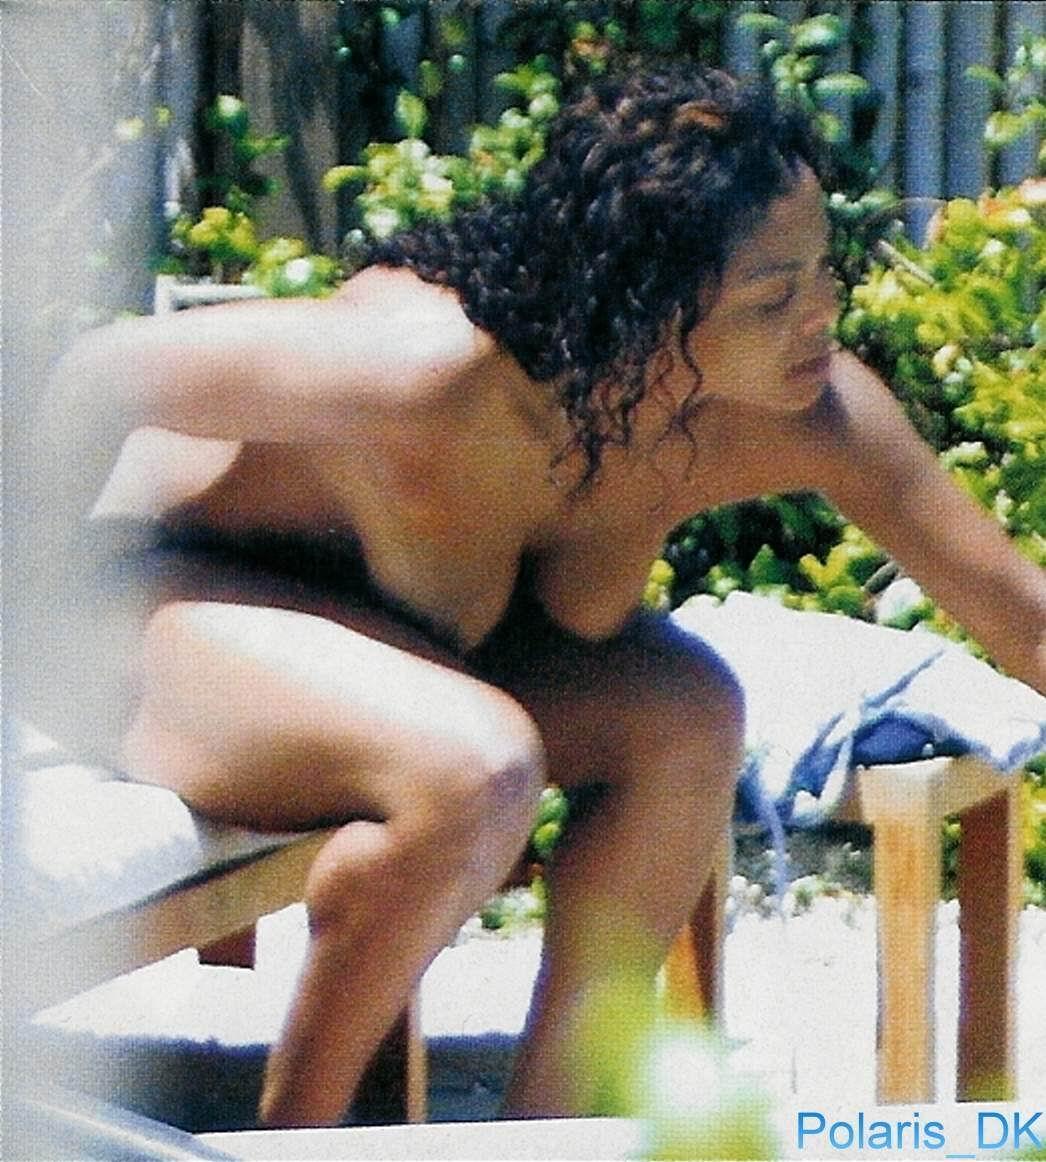 8-track reccomend Janet jackson nude sunbathing clip